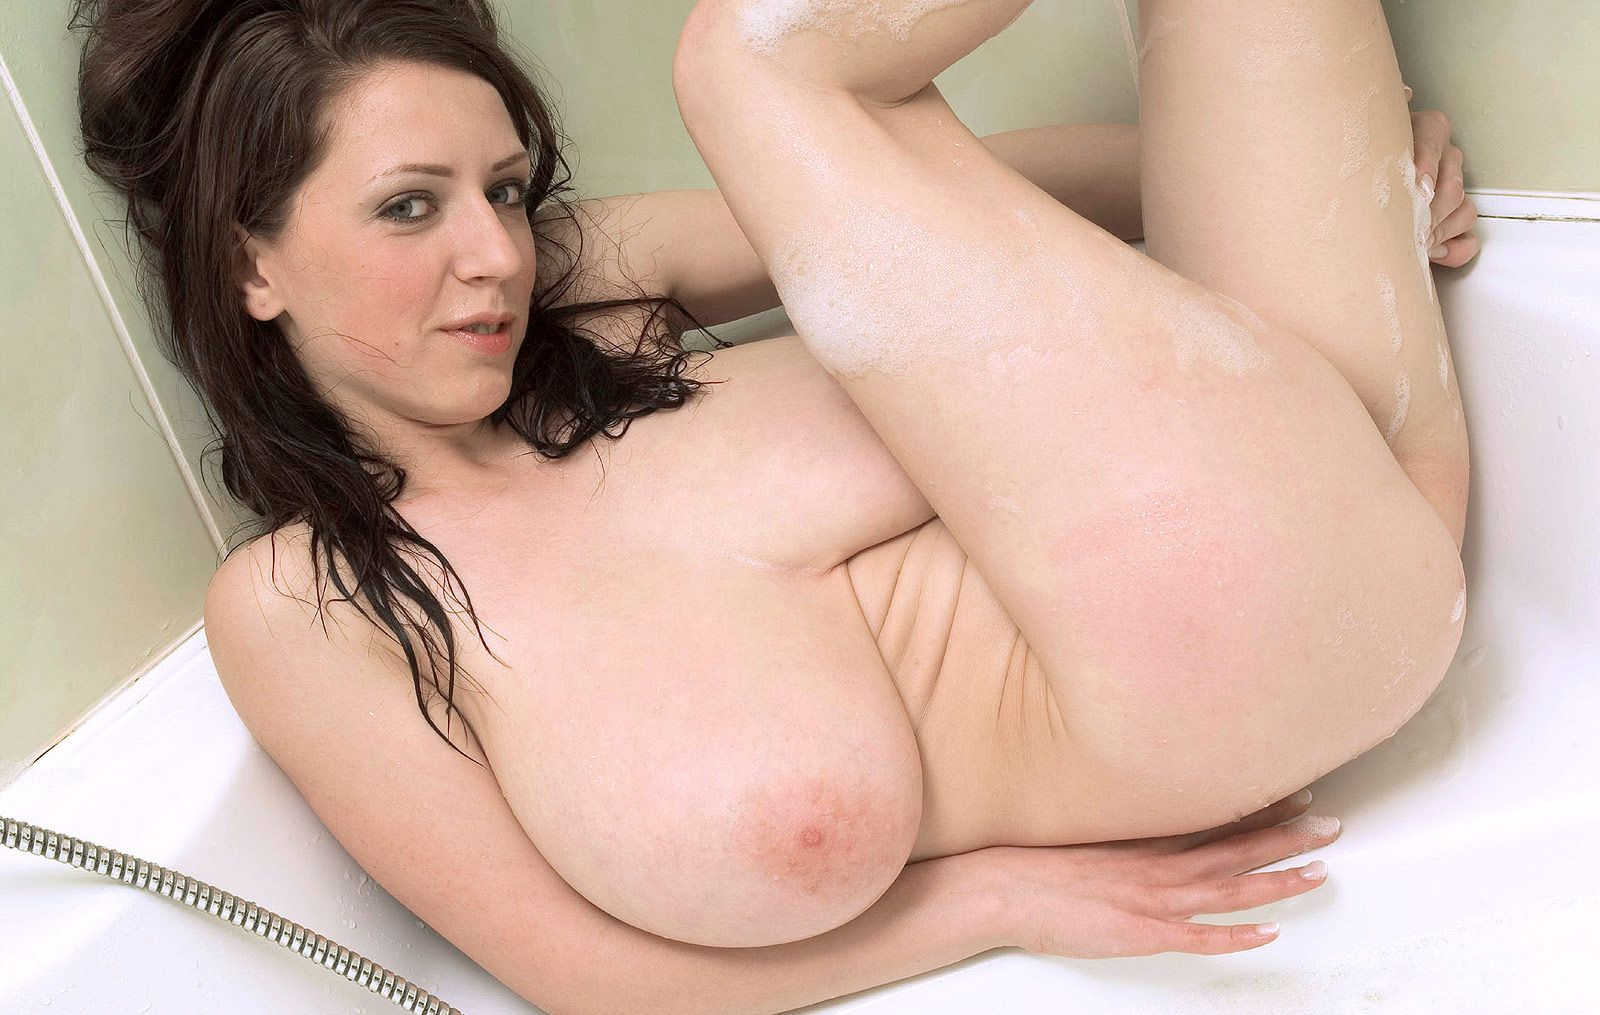 Busty live sex machine web with indigo augustine 9